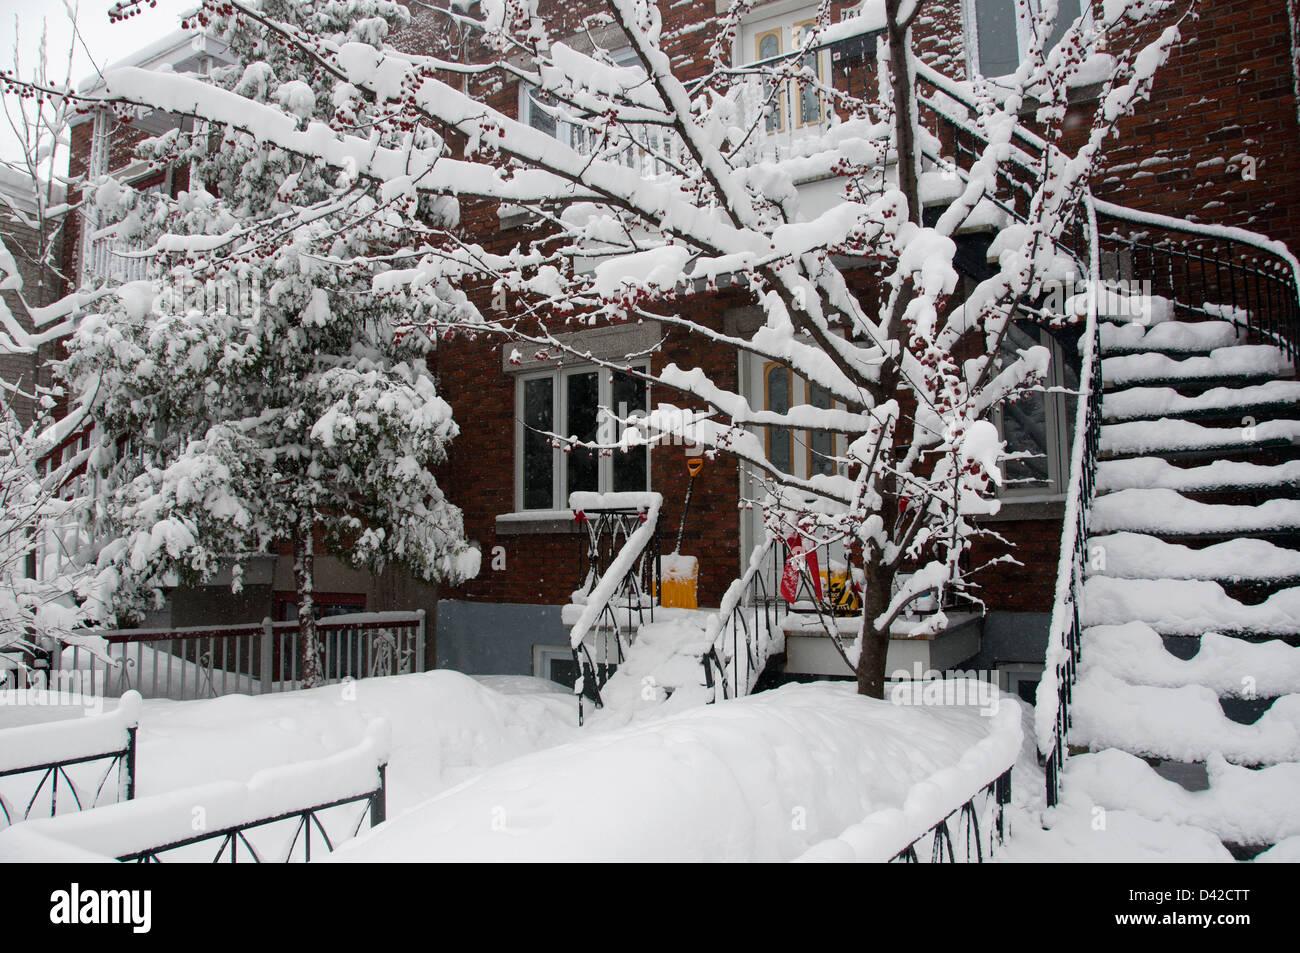 Villeray area Montreal, winter scene - Stock Image